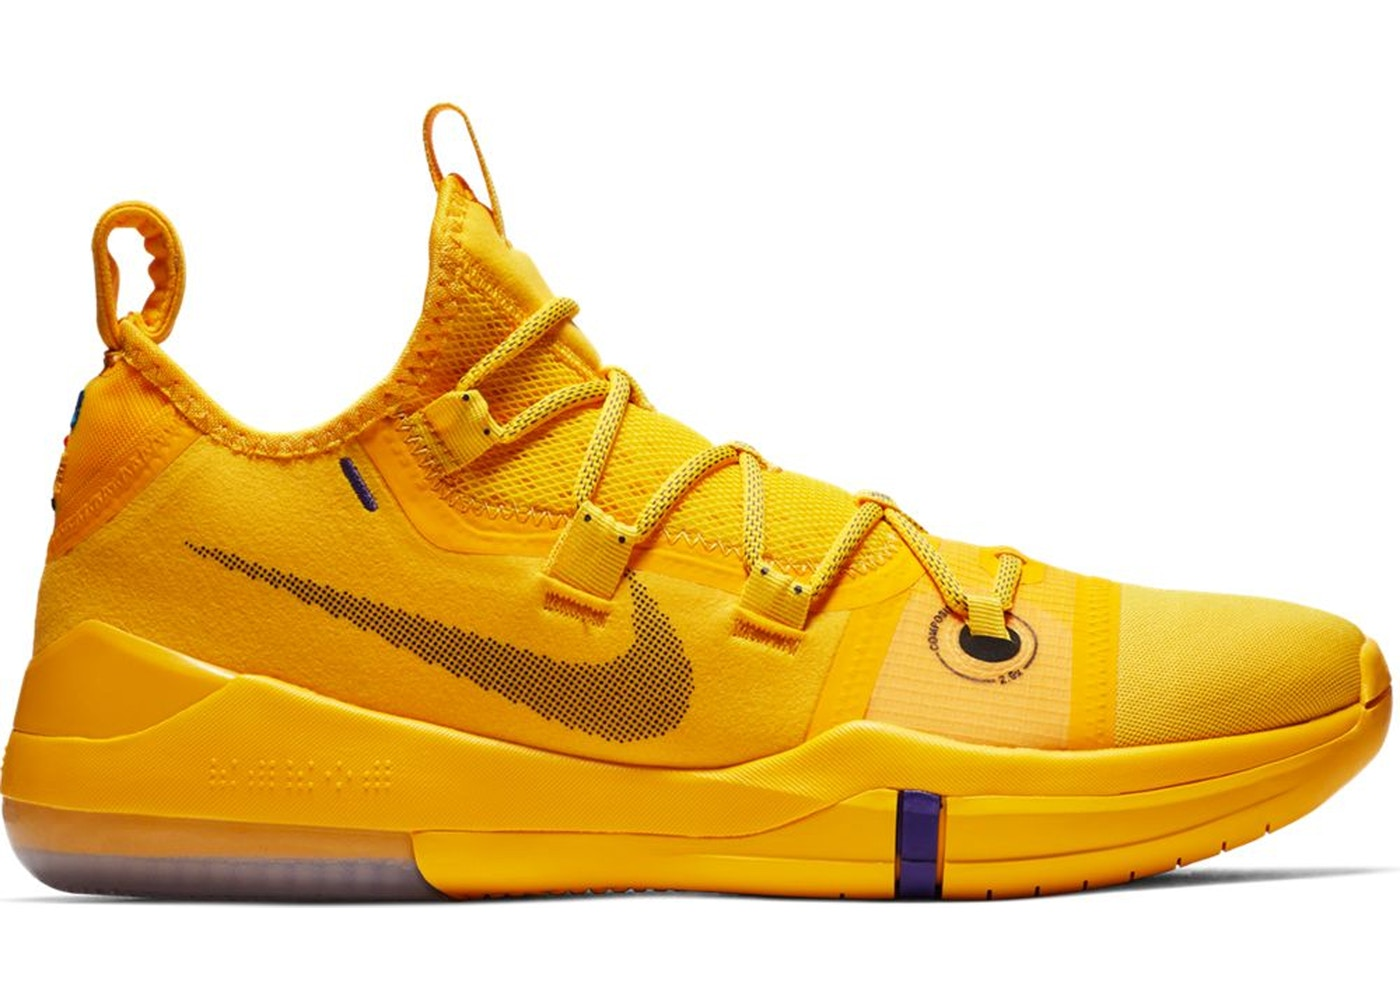 newest a3a92 0f6c3 Buy Nike Kobe Shoes   Deadstock Sneakers